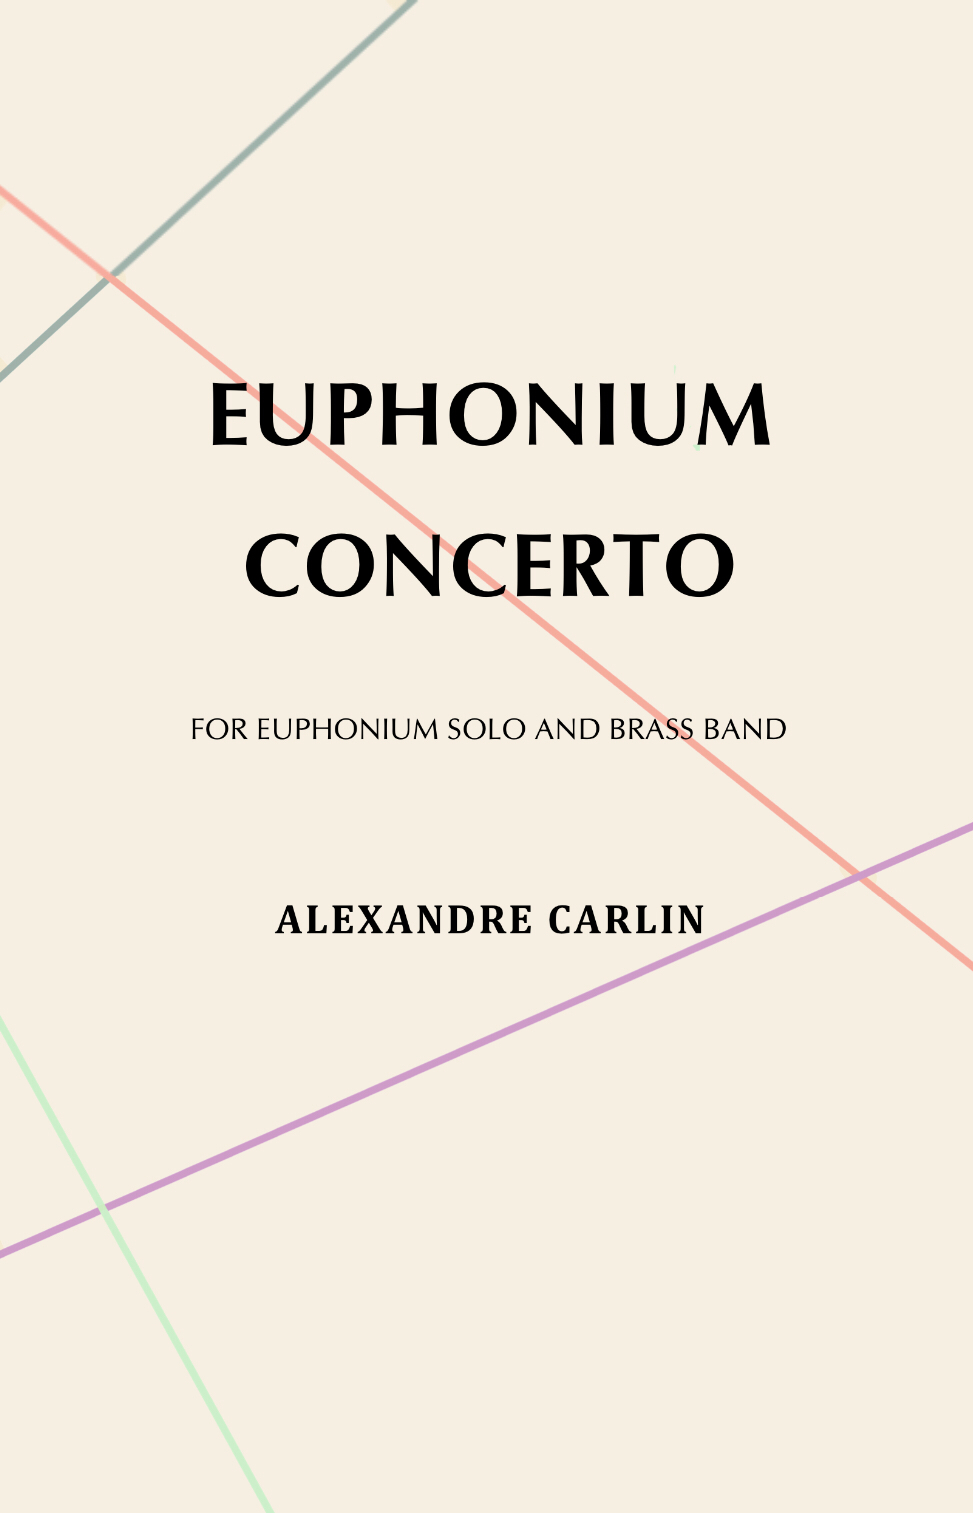 Euphonium Concerto: Brass Band Version by Alexandre Carlin